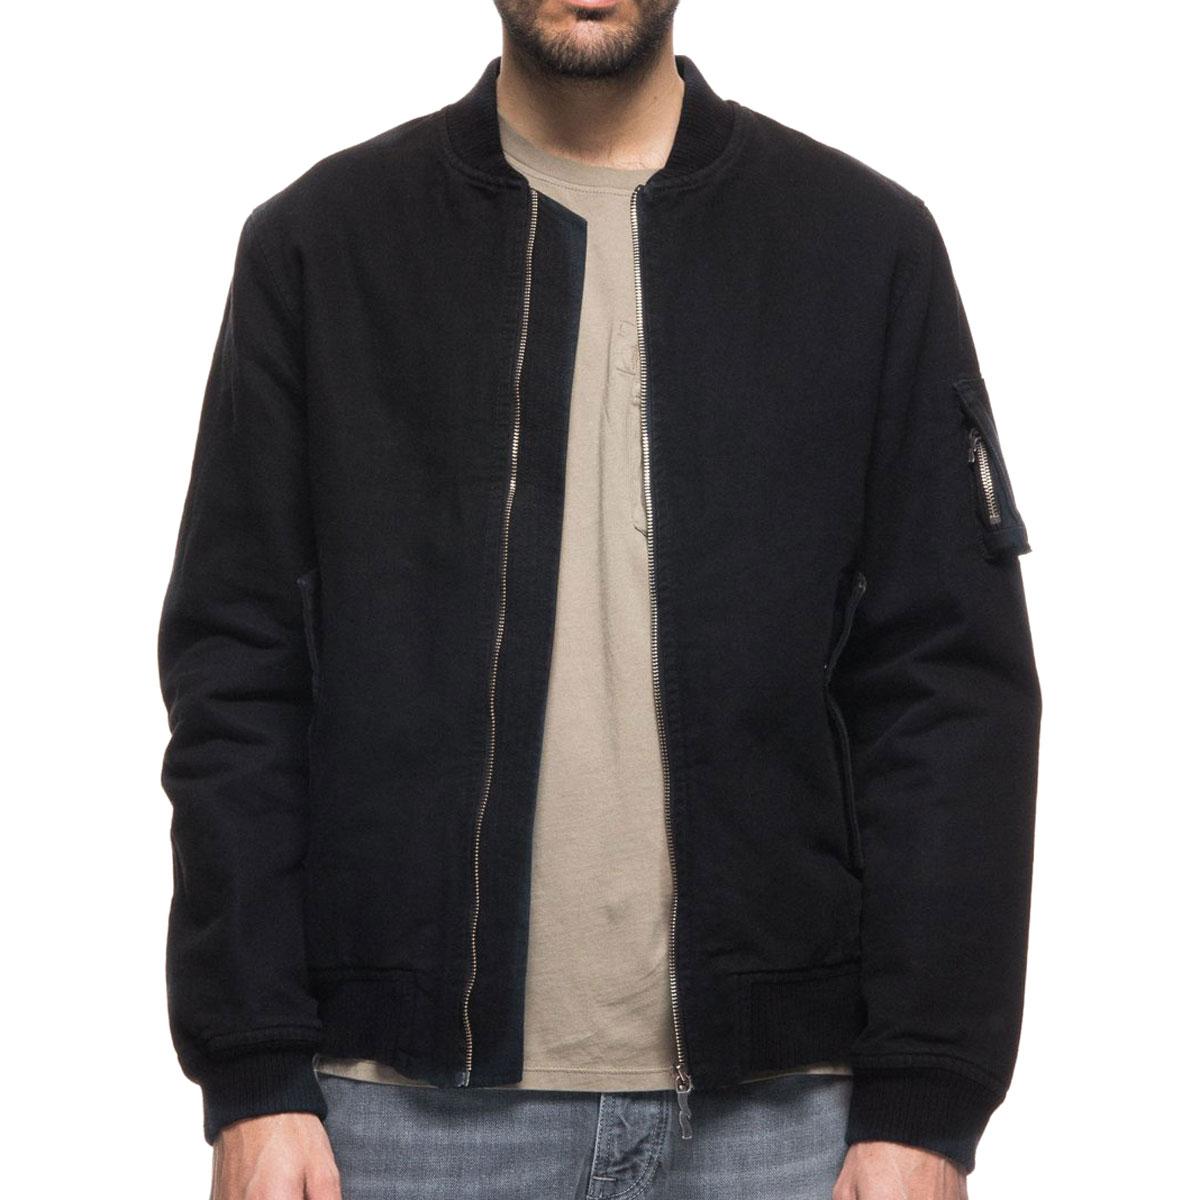 Nudie Jeans ジャケット MA-1 ALEXANDER BOMBER JACKET 160518 5011 BLACK